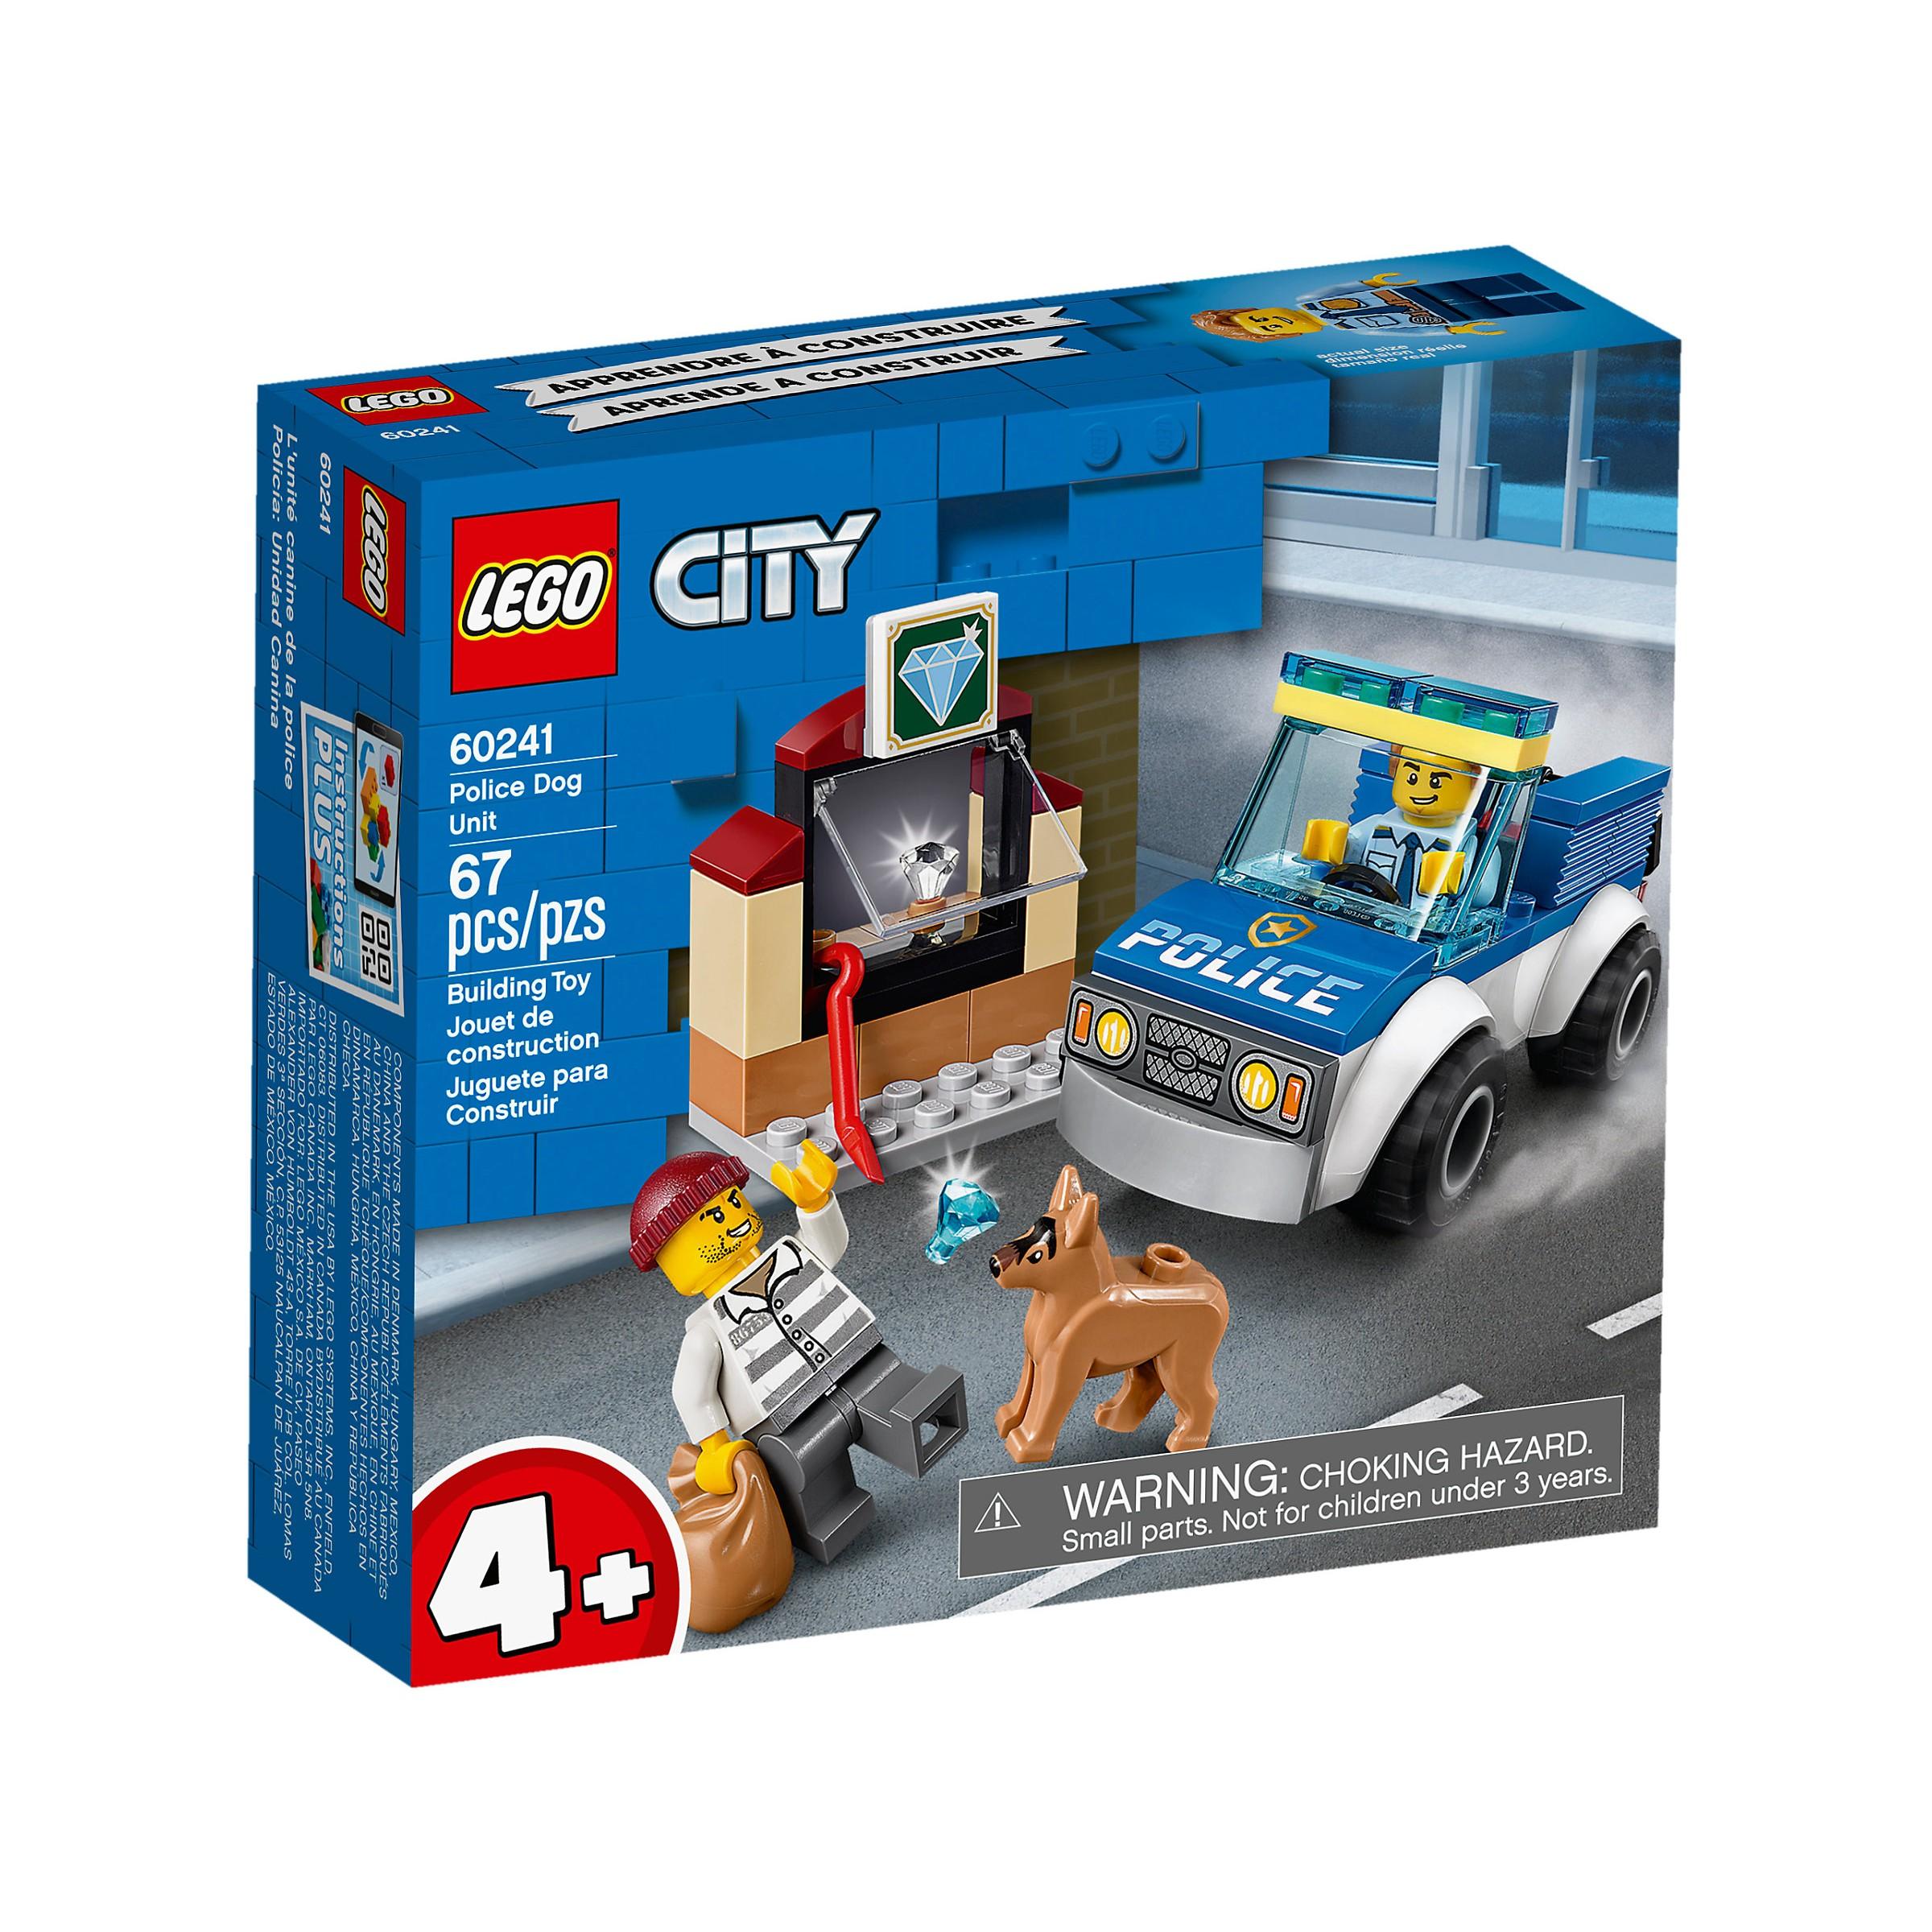 LEGO 60241 City Police Dog Unit at Toys R Us